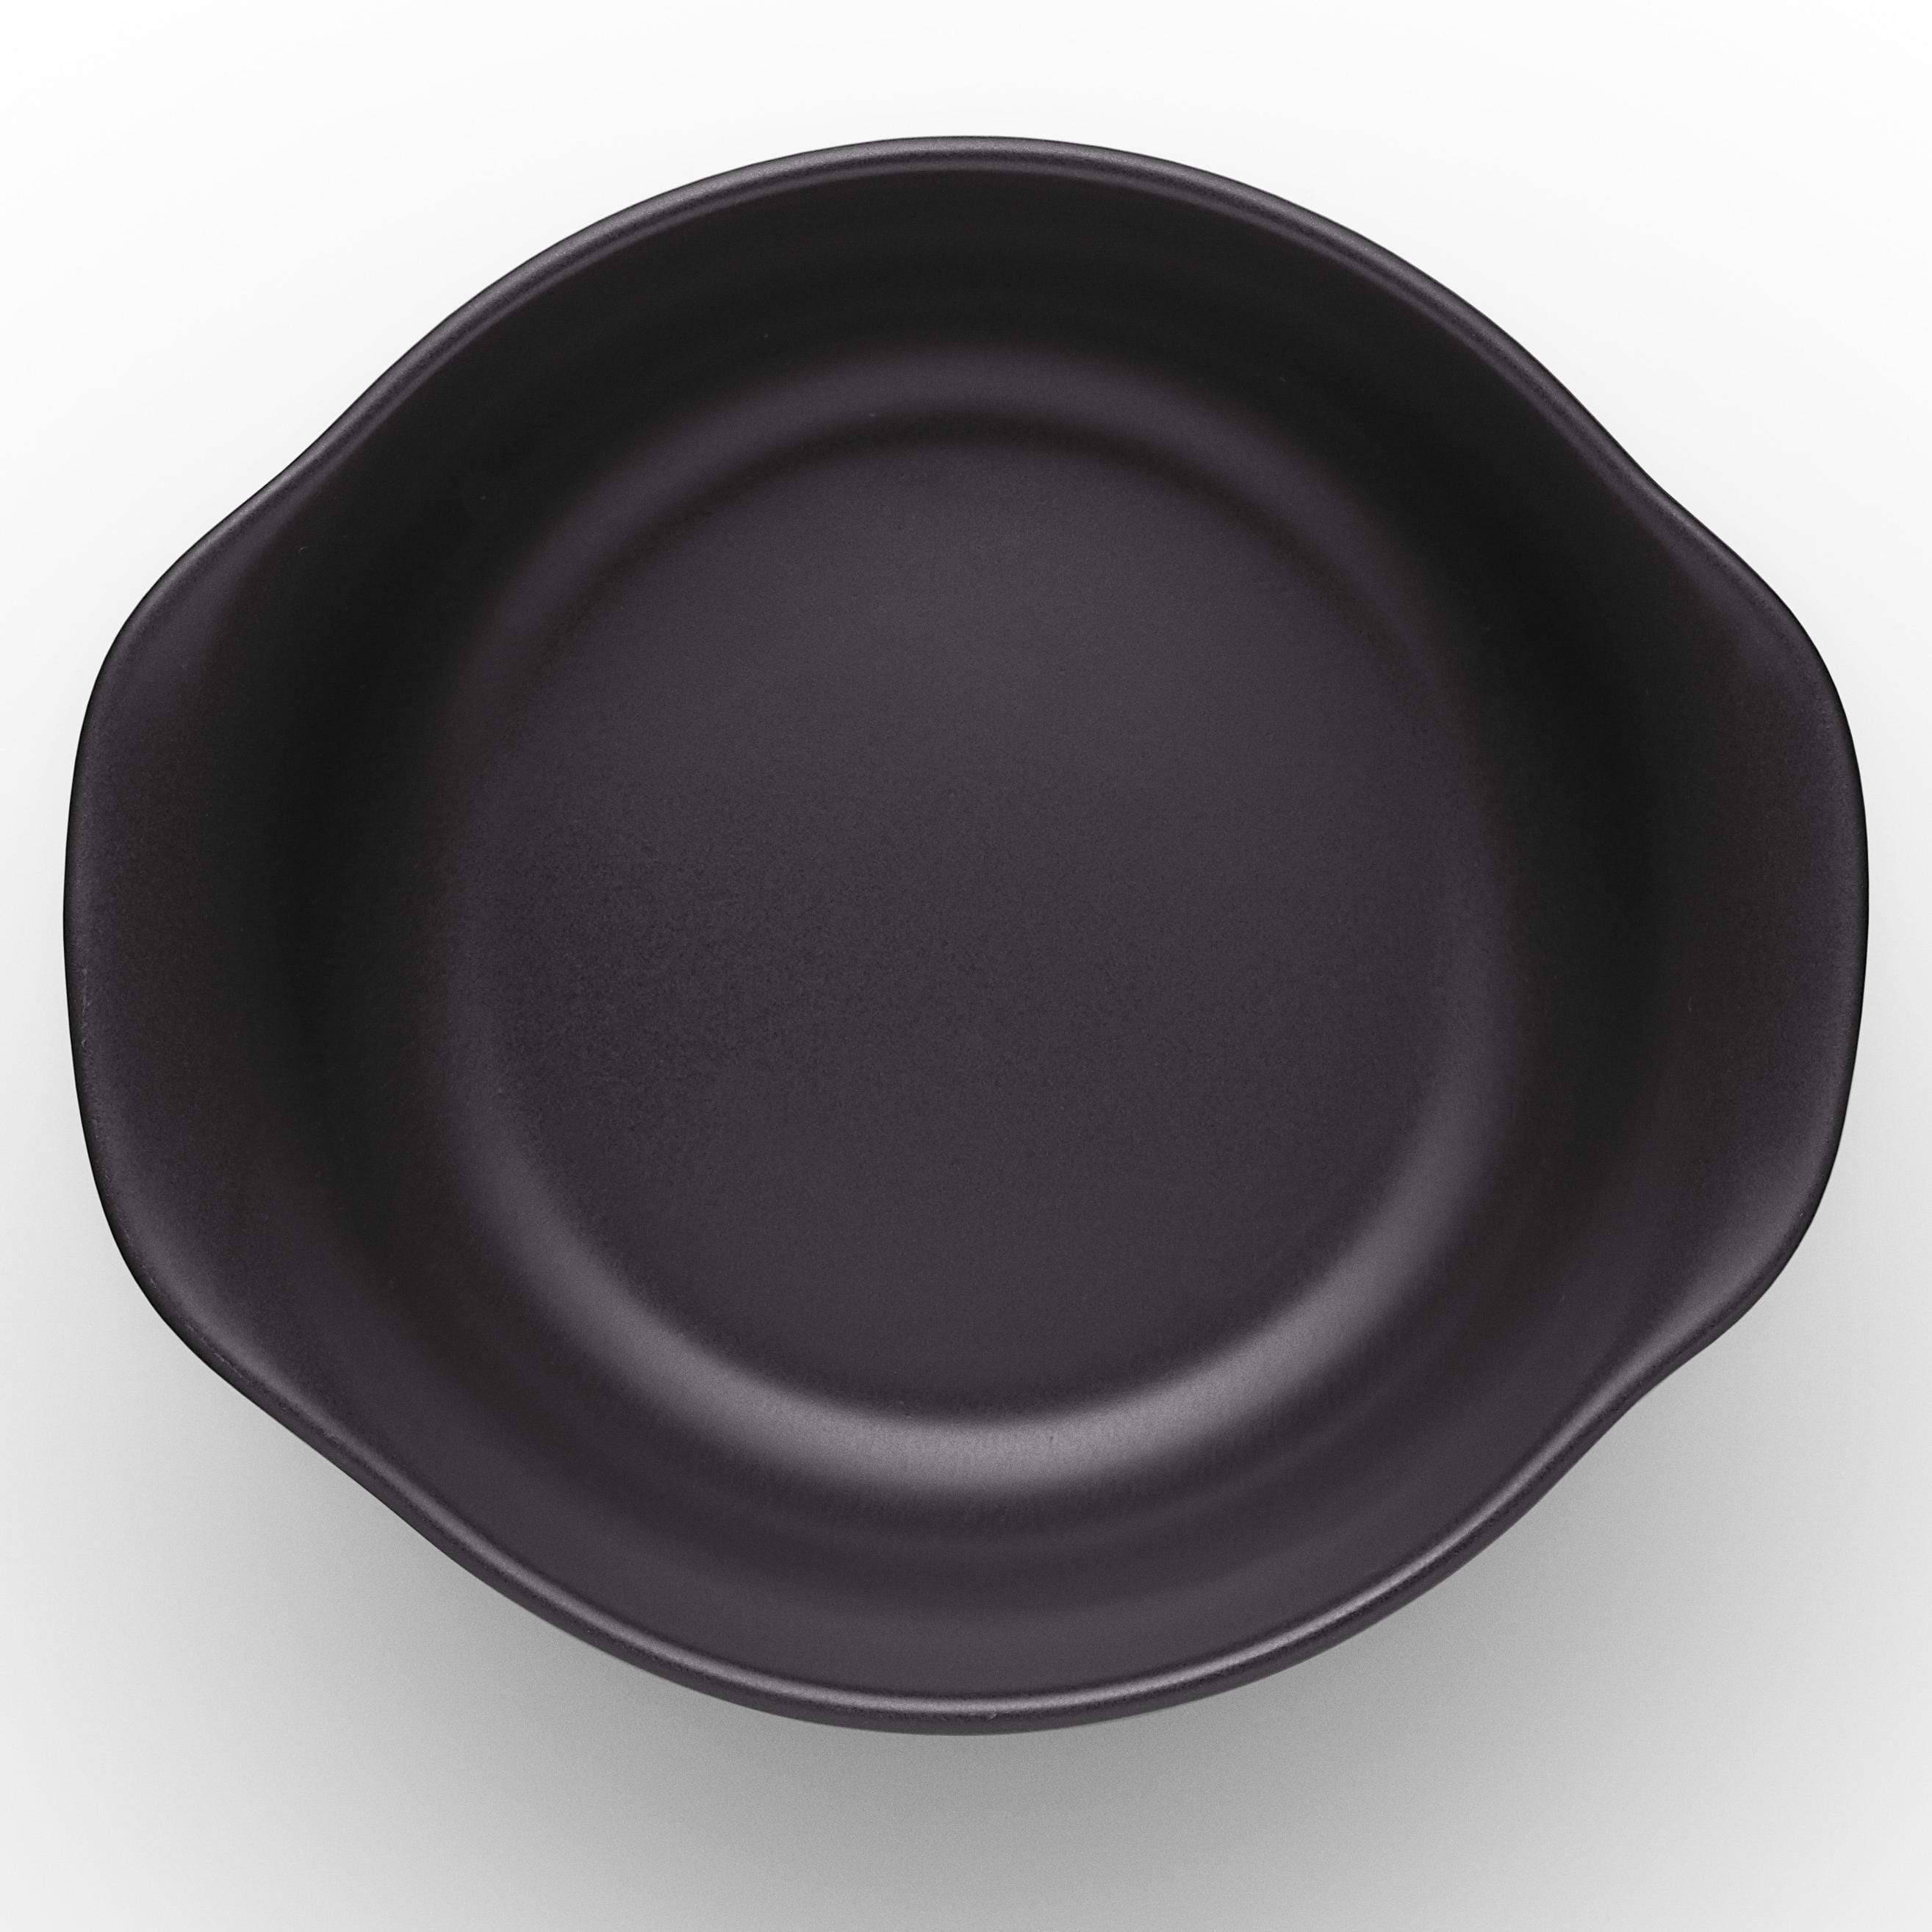 Eva Solo Nordic Kitchen Bowls